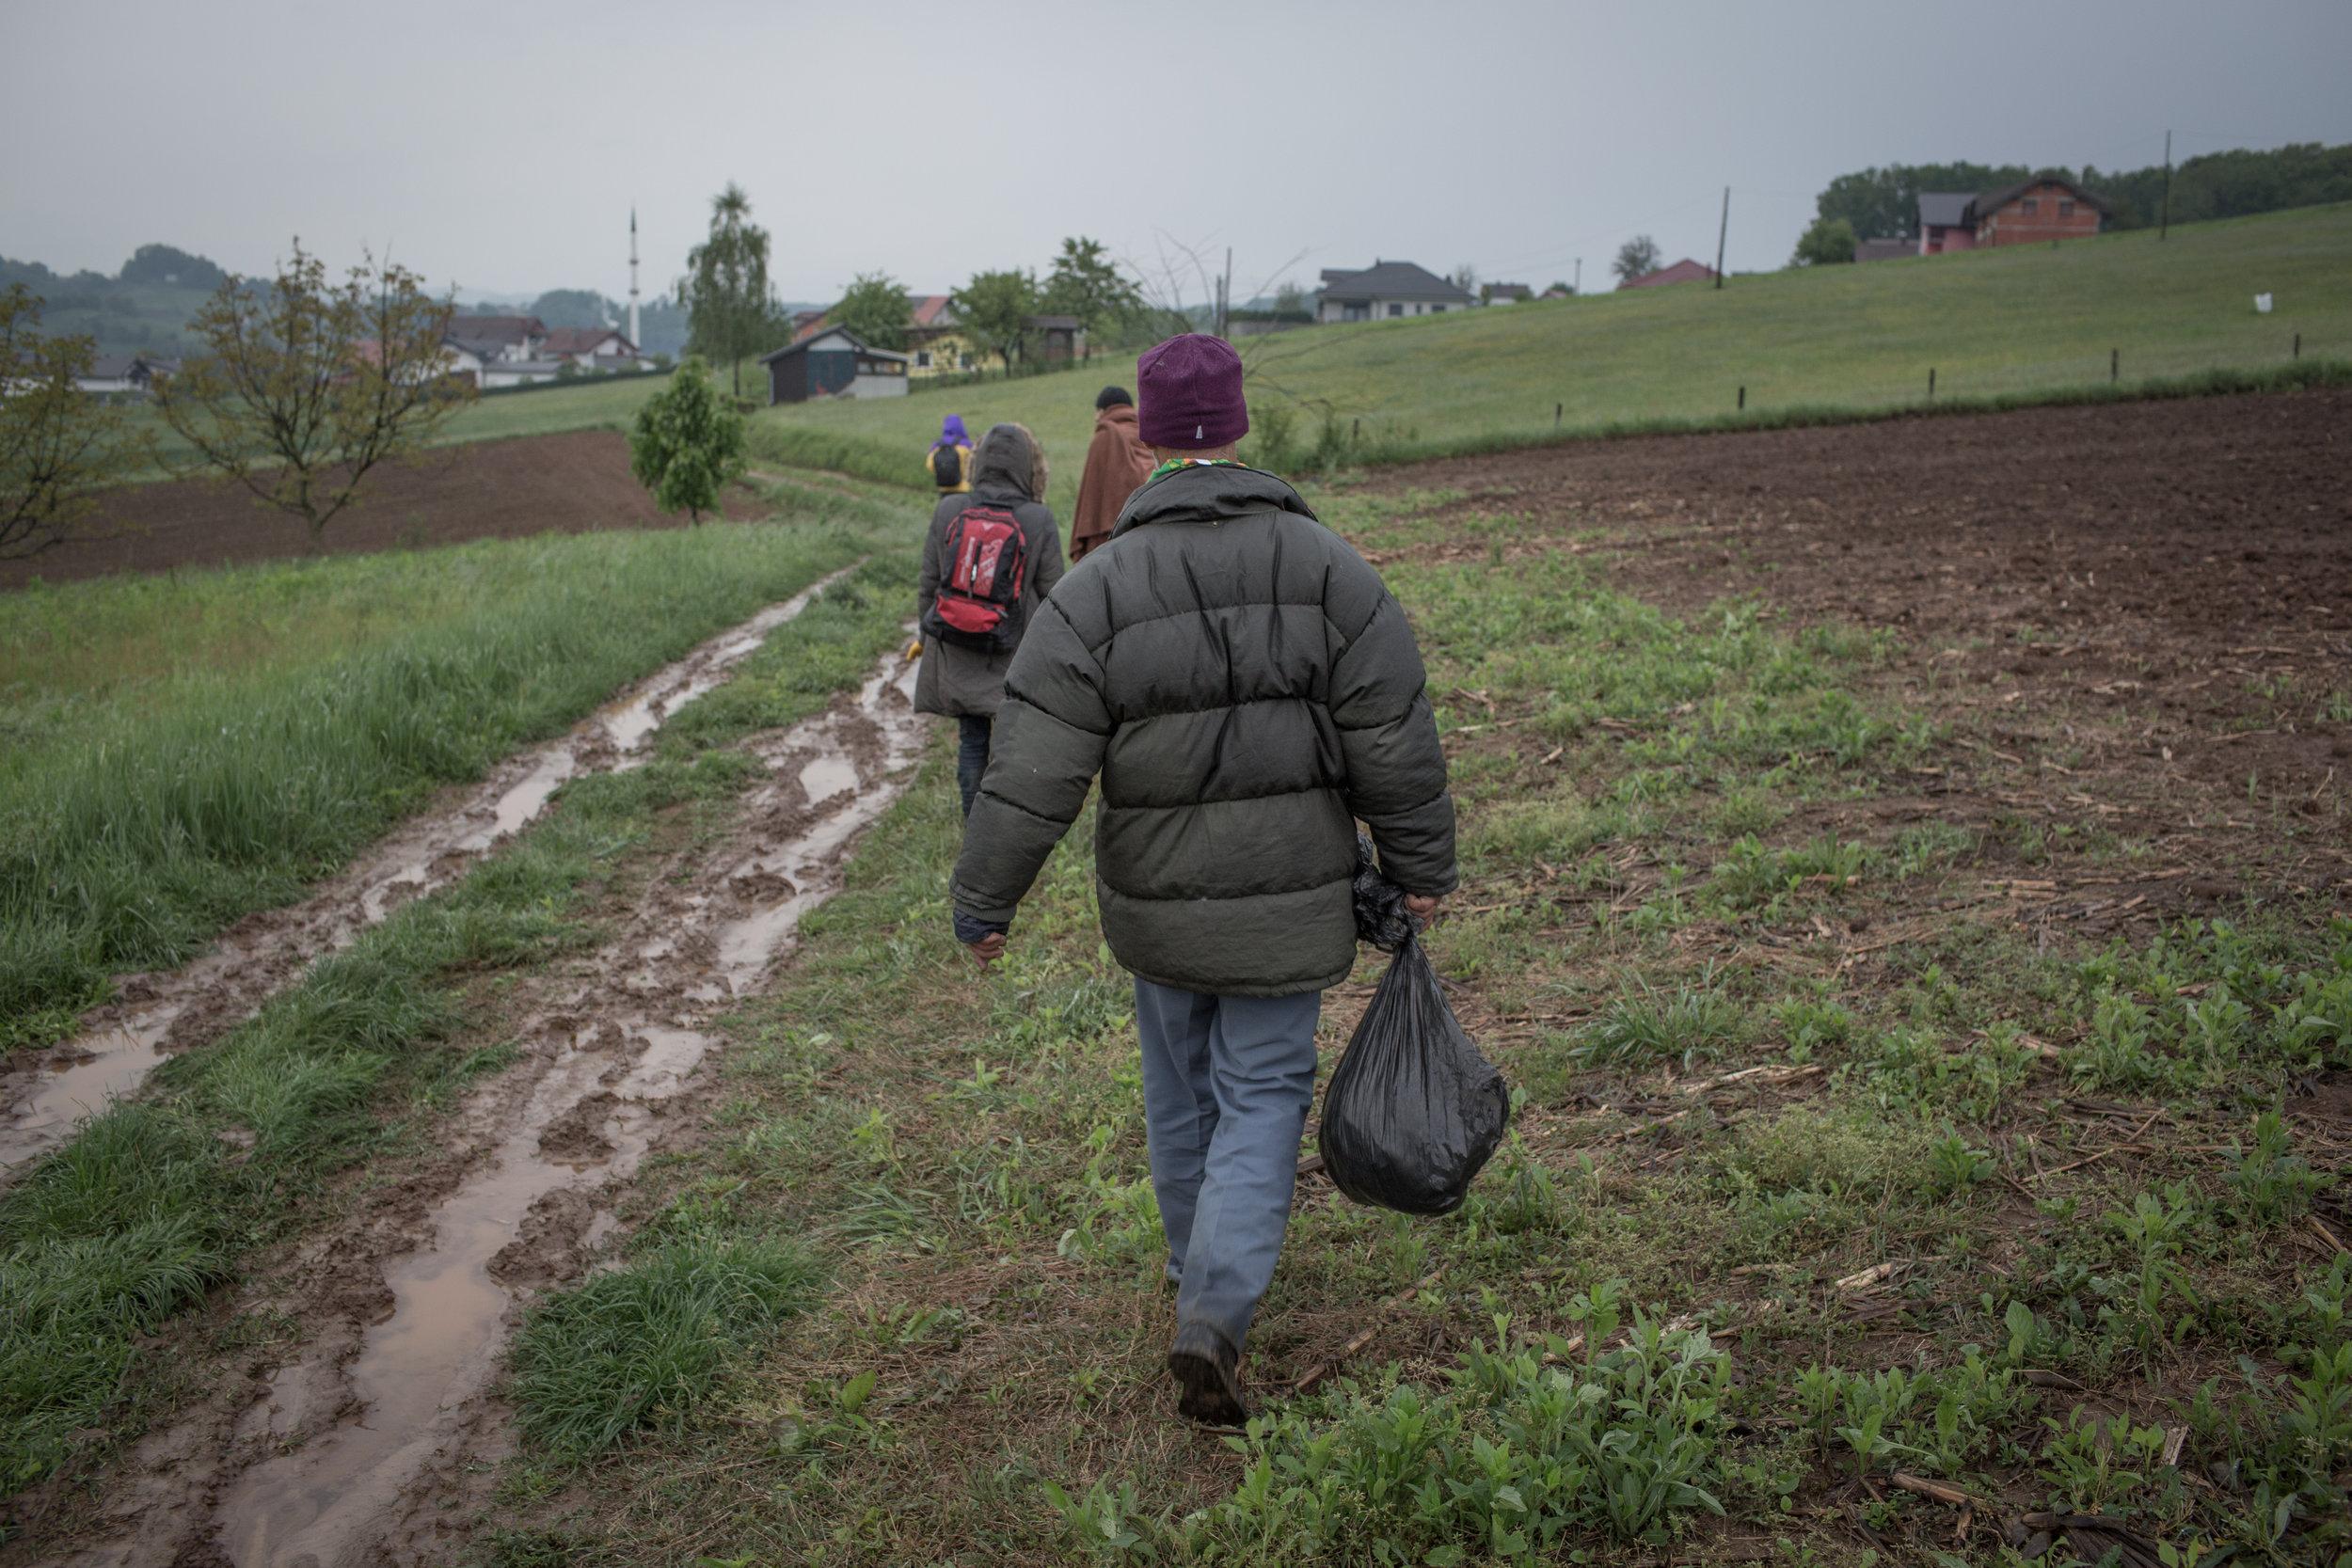 Finding a place to rest in Velika Kladuša after Croatian police returned them to BiH.